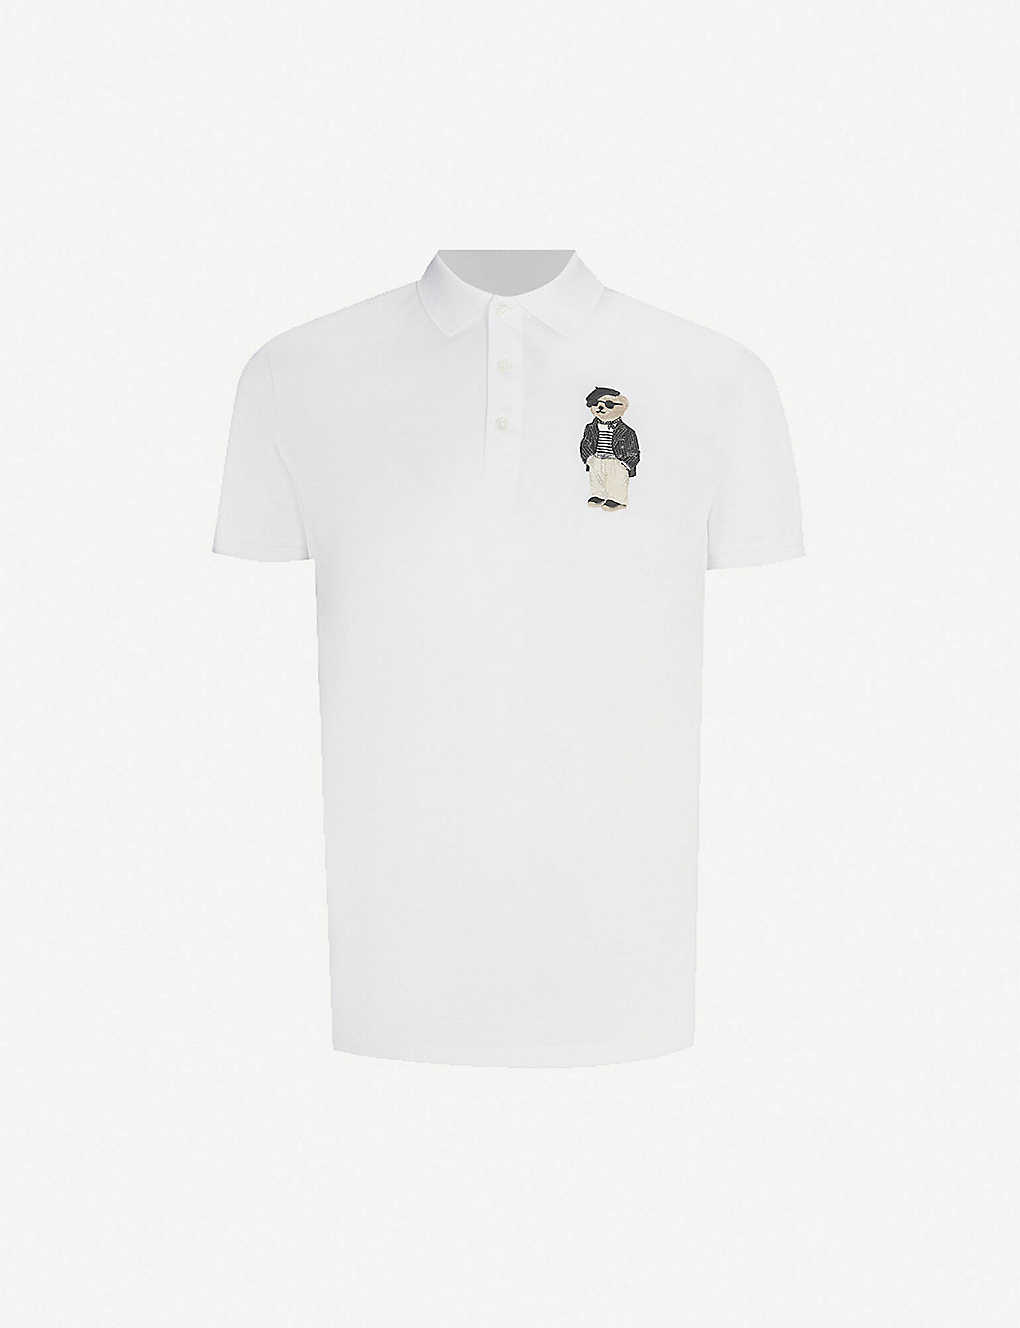 ed39ad85a RALPH LAUREN PURPLE LABEL - Polo Bear cotton-piqué polo shirt ...